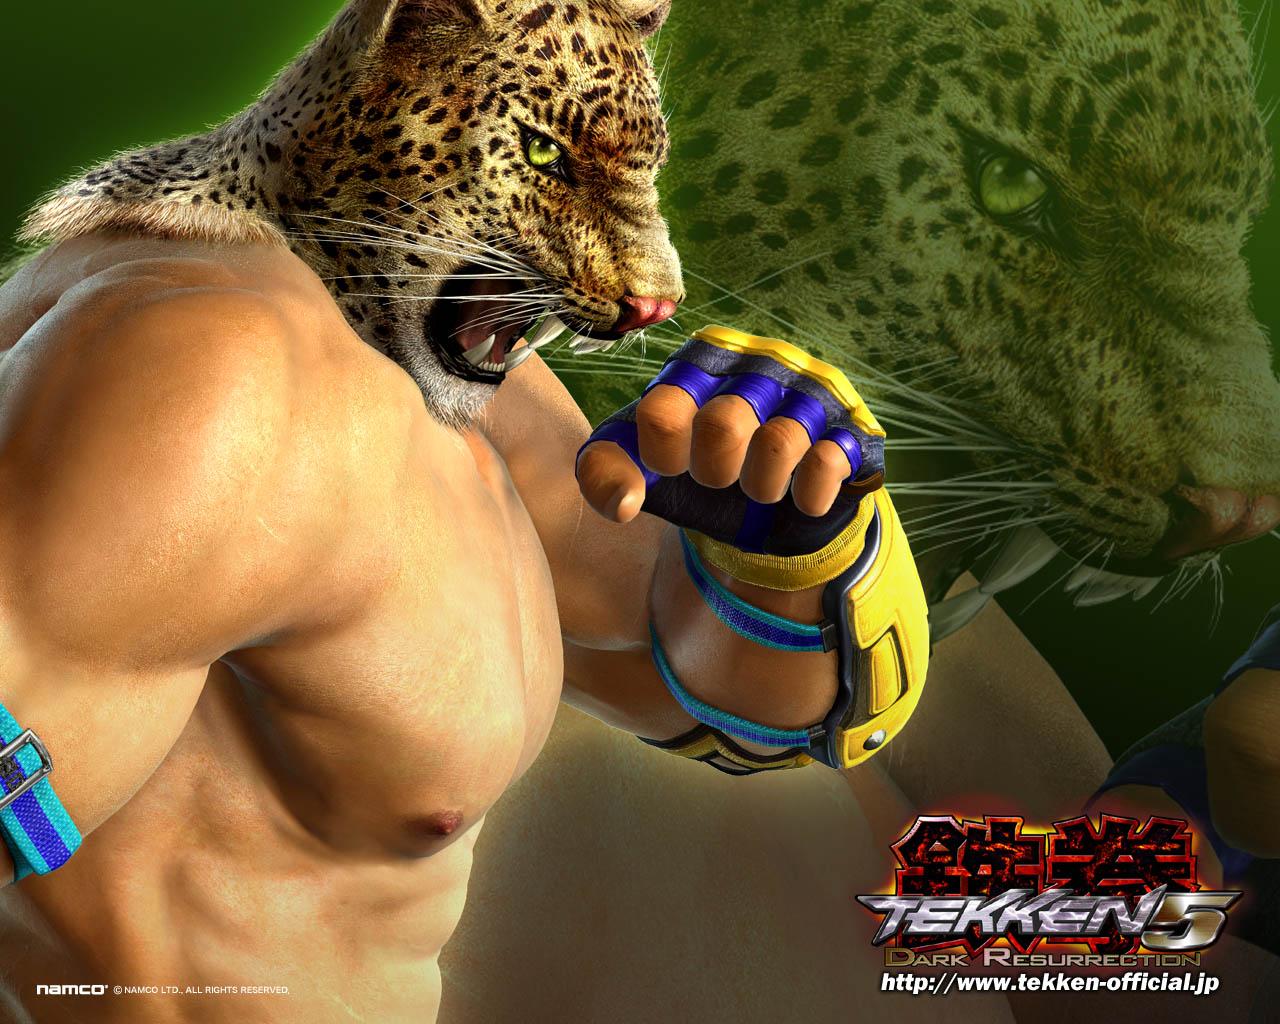 46 Tekken King Destiny Game Wallpaper On Wallpapersafari